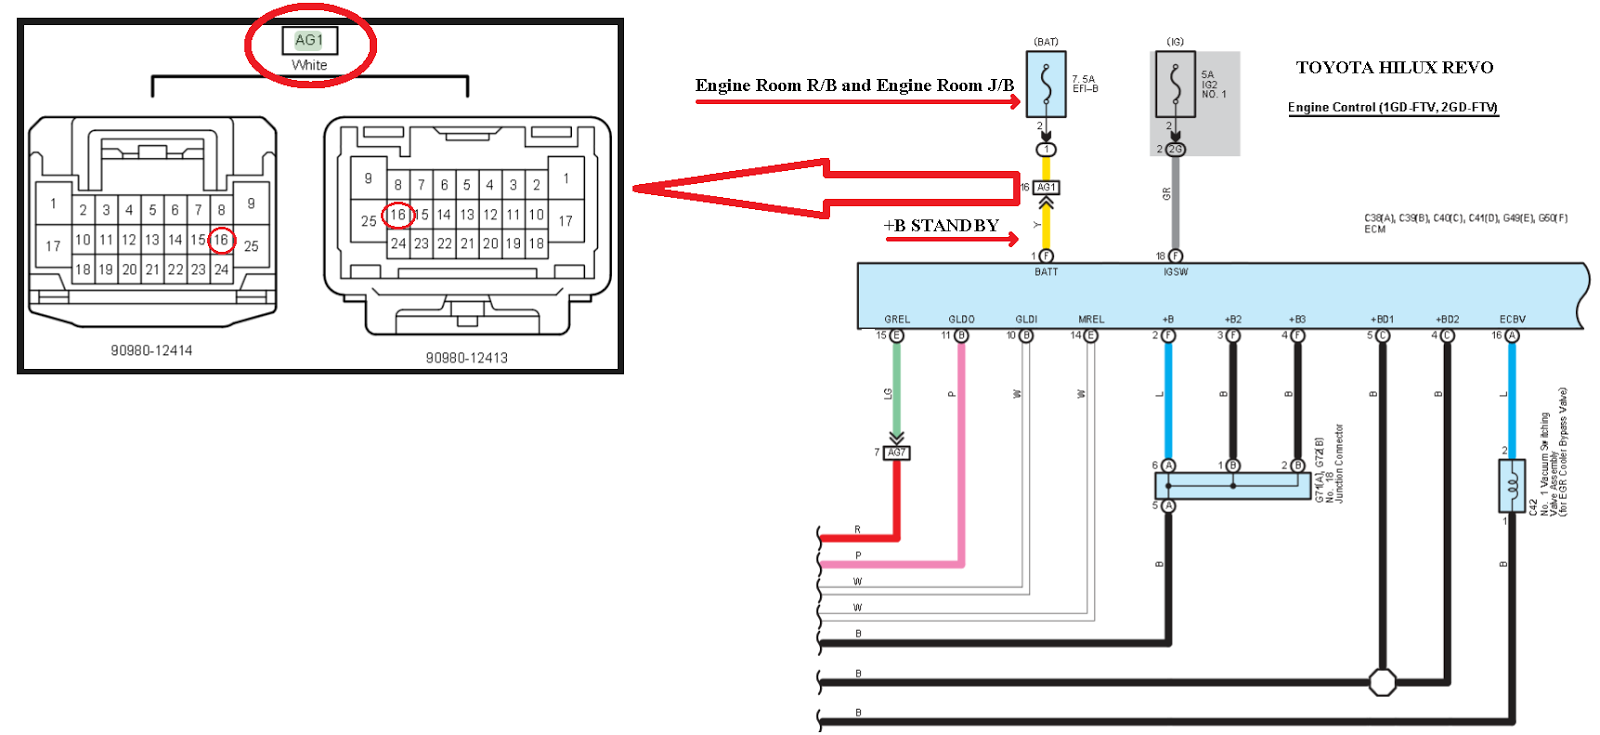 toyota hilux revo wiring wiring diagram nametoyota hilux revo wiring engine hilux revo ecm power source [ 1600 x 735 Pixel ]